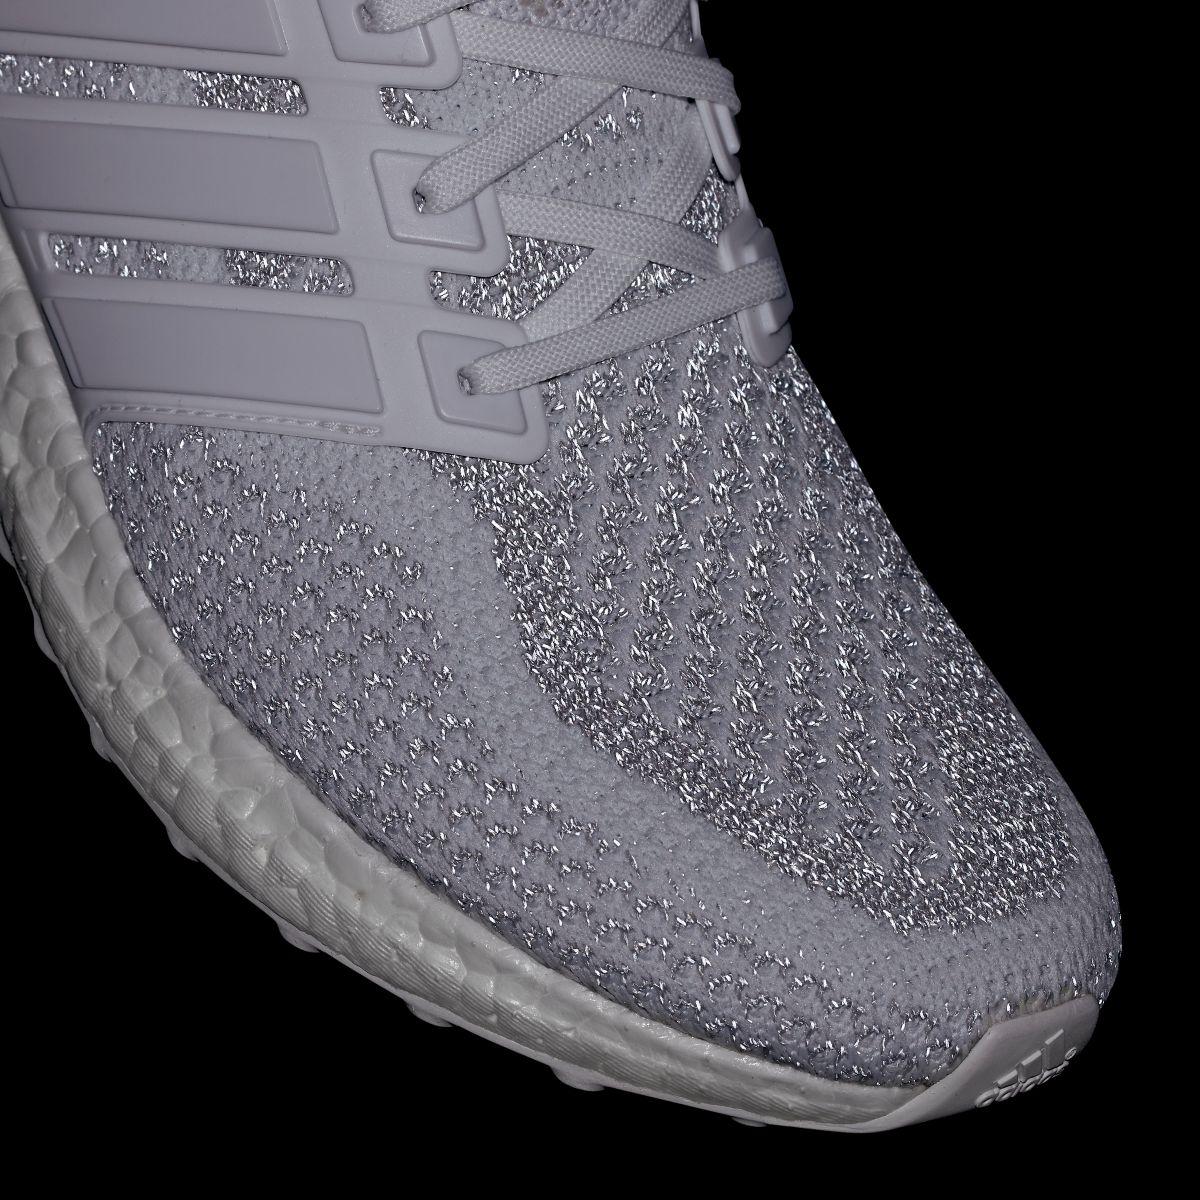 38da2cf3215 Adidas adidas ultra boost LTD GLOW Lady s men BB3928 running shoes sports  shoes